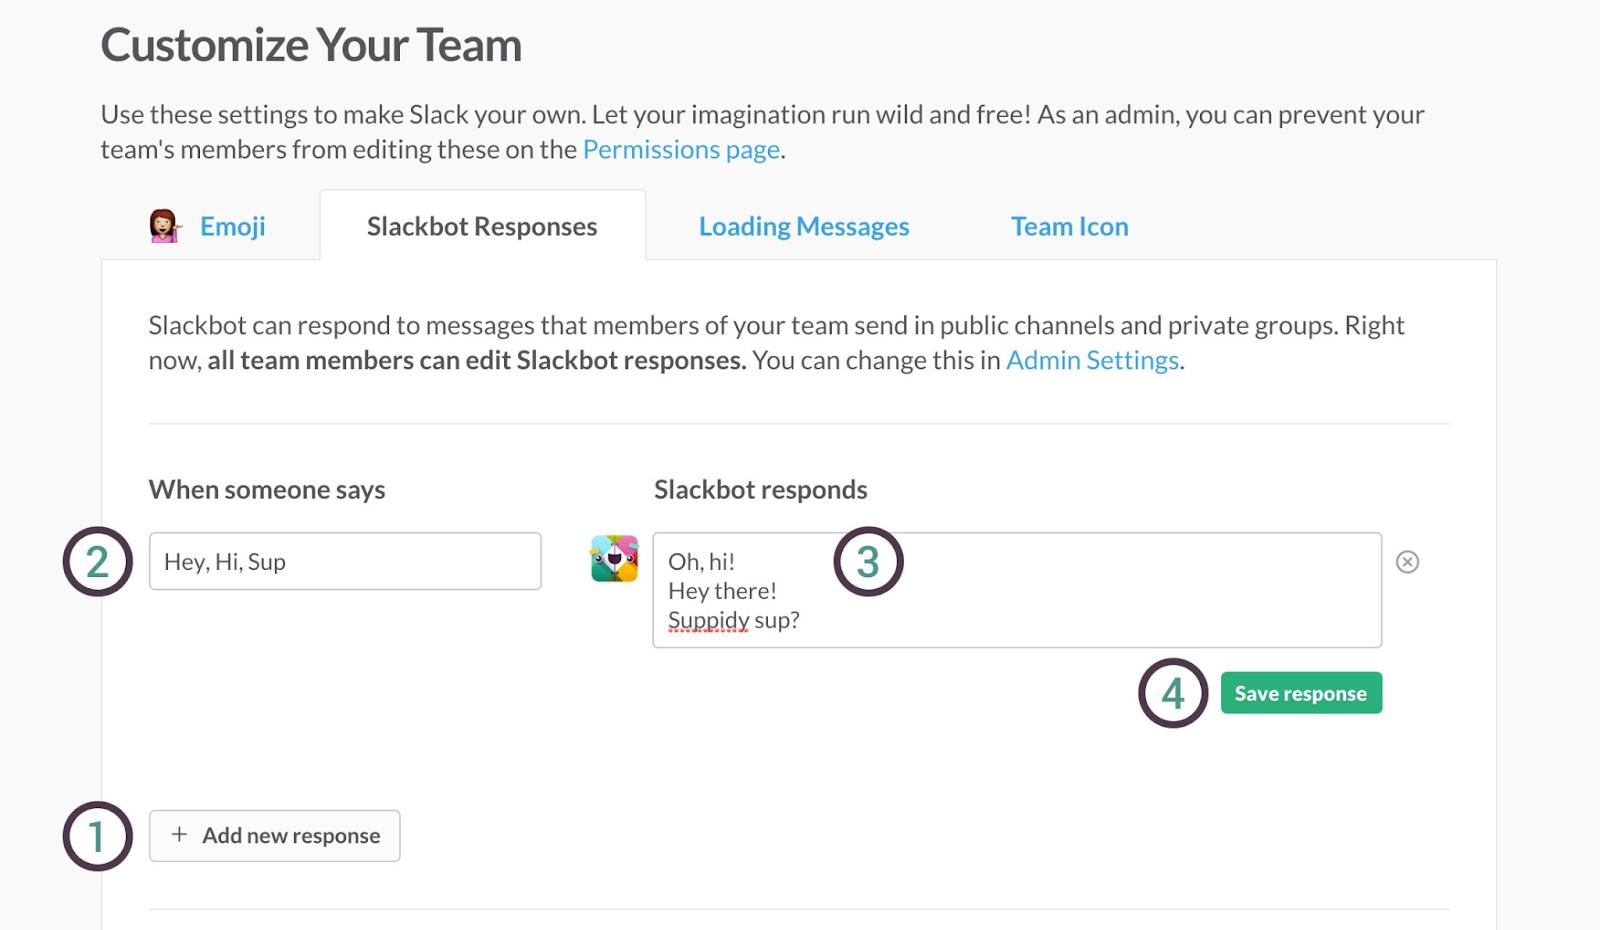 Product Customization - Slack